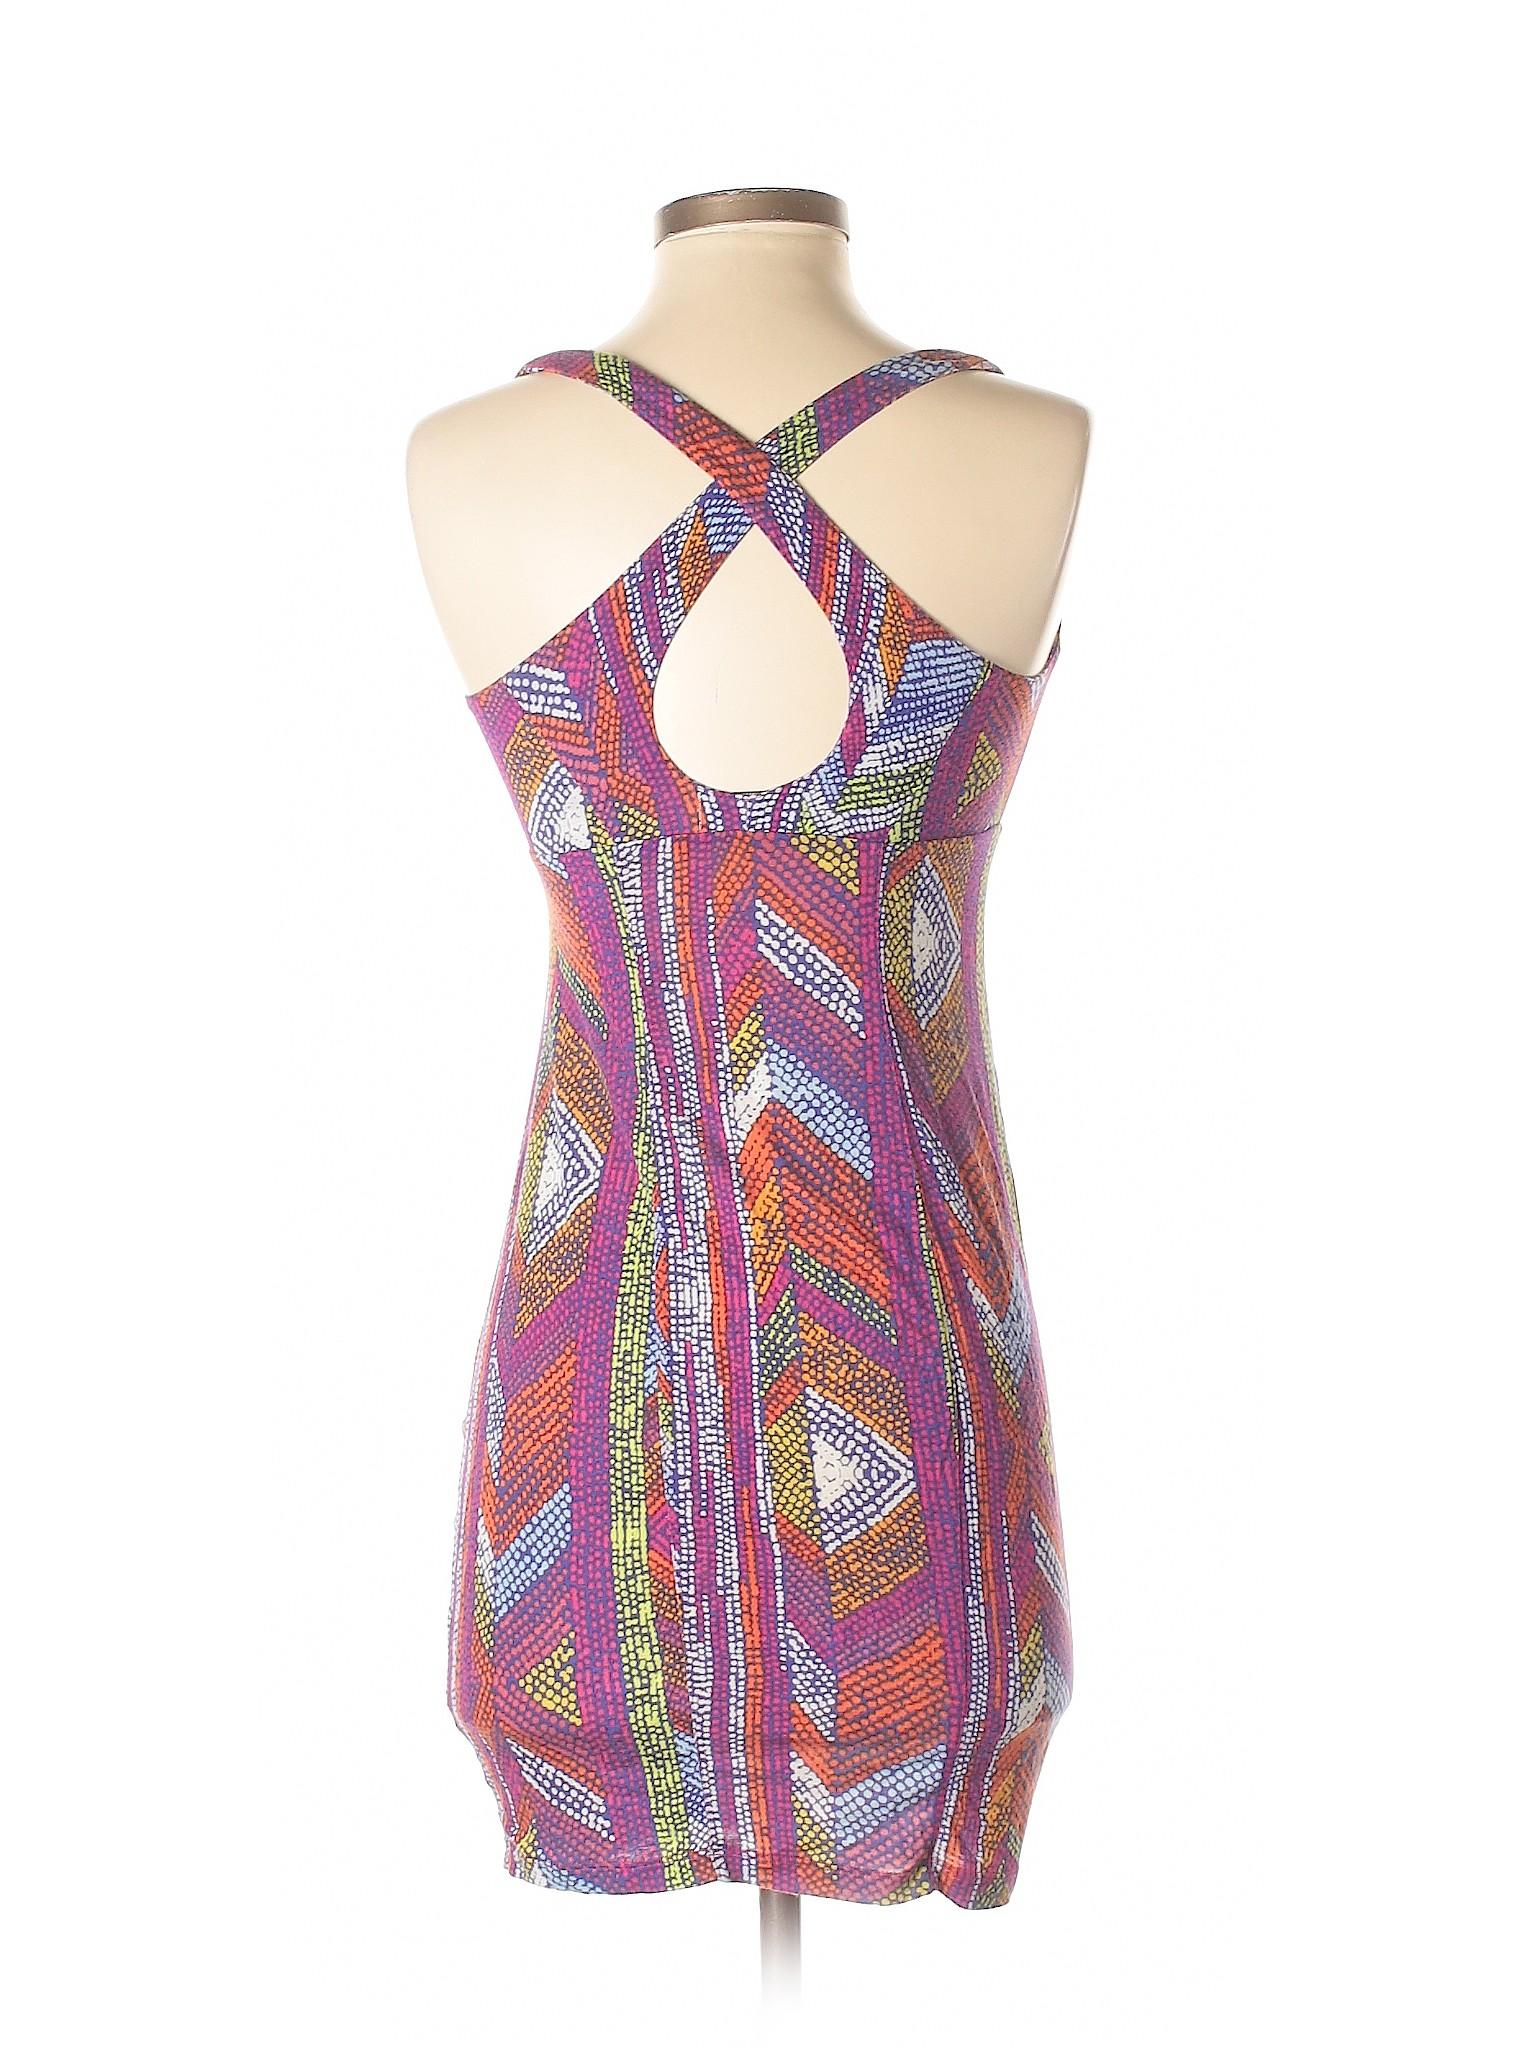 Selling Casual Vita Vita Dress Selling Casual Selling Dress Dolce Dolce Dolce Y7Oqdqw